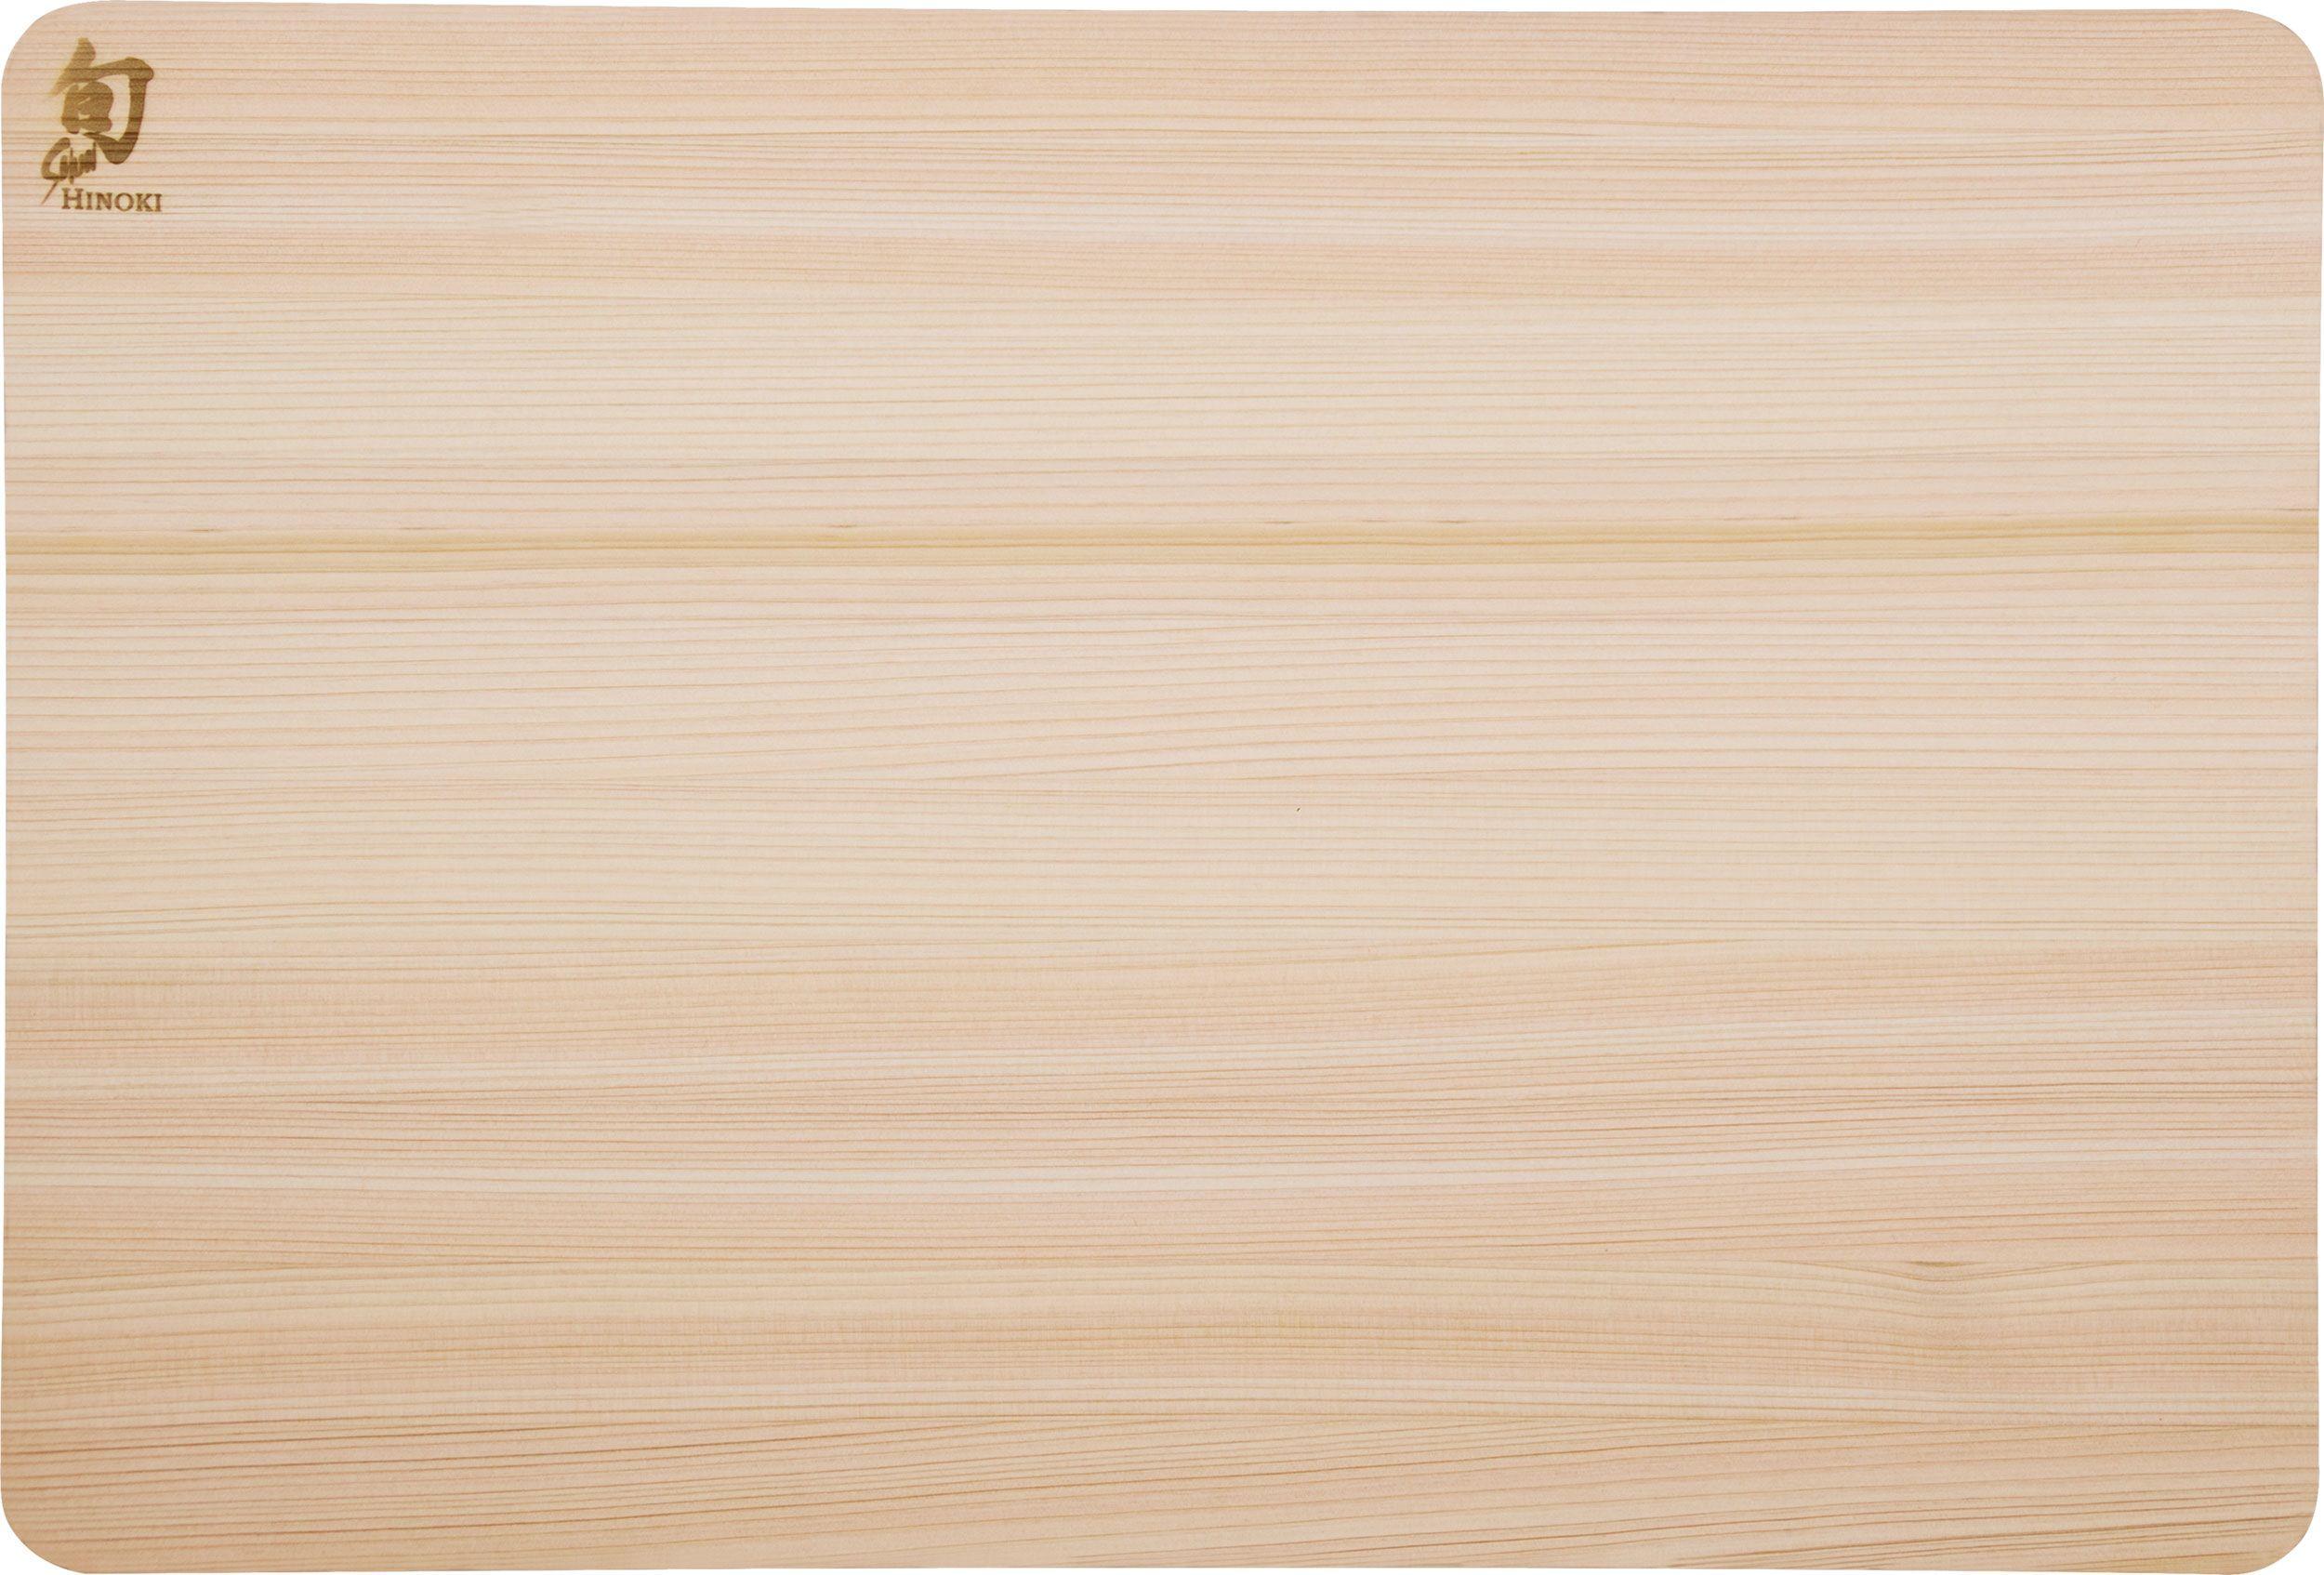 Shun DM0816 Hinoki Cutting Board, Medium, 15.75 inch x 10.75 inch x 0.5 inch